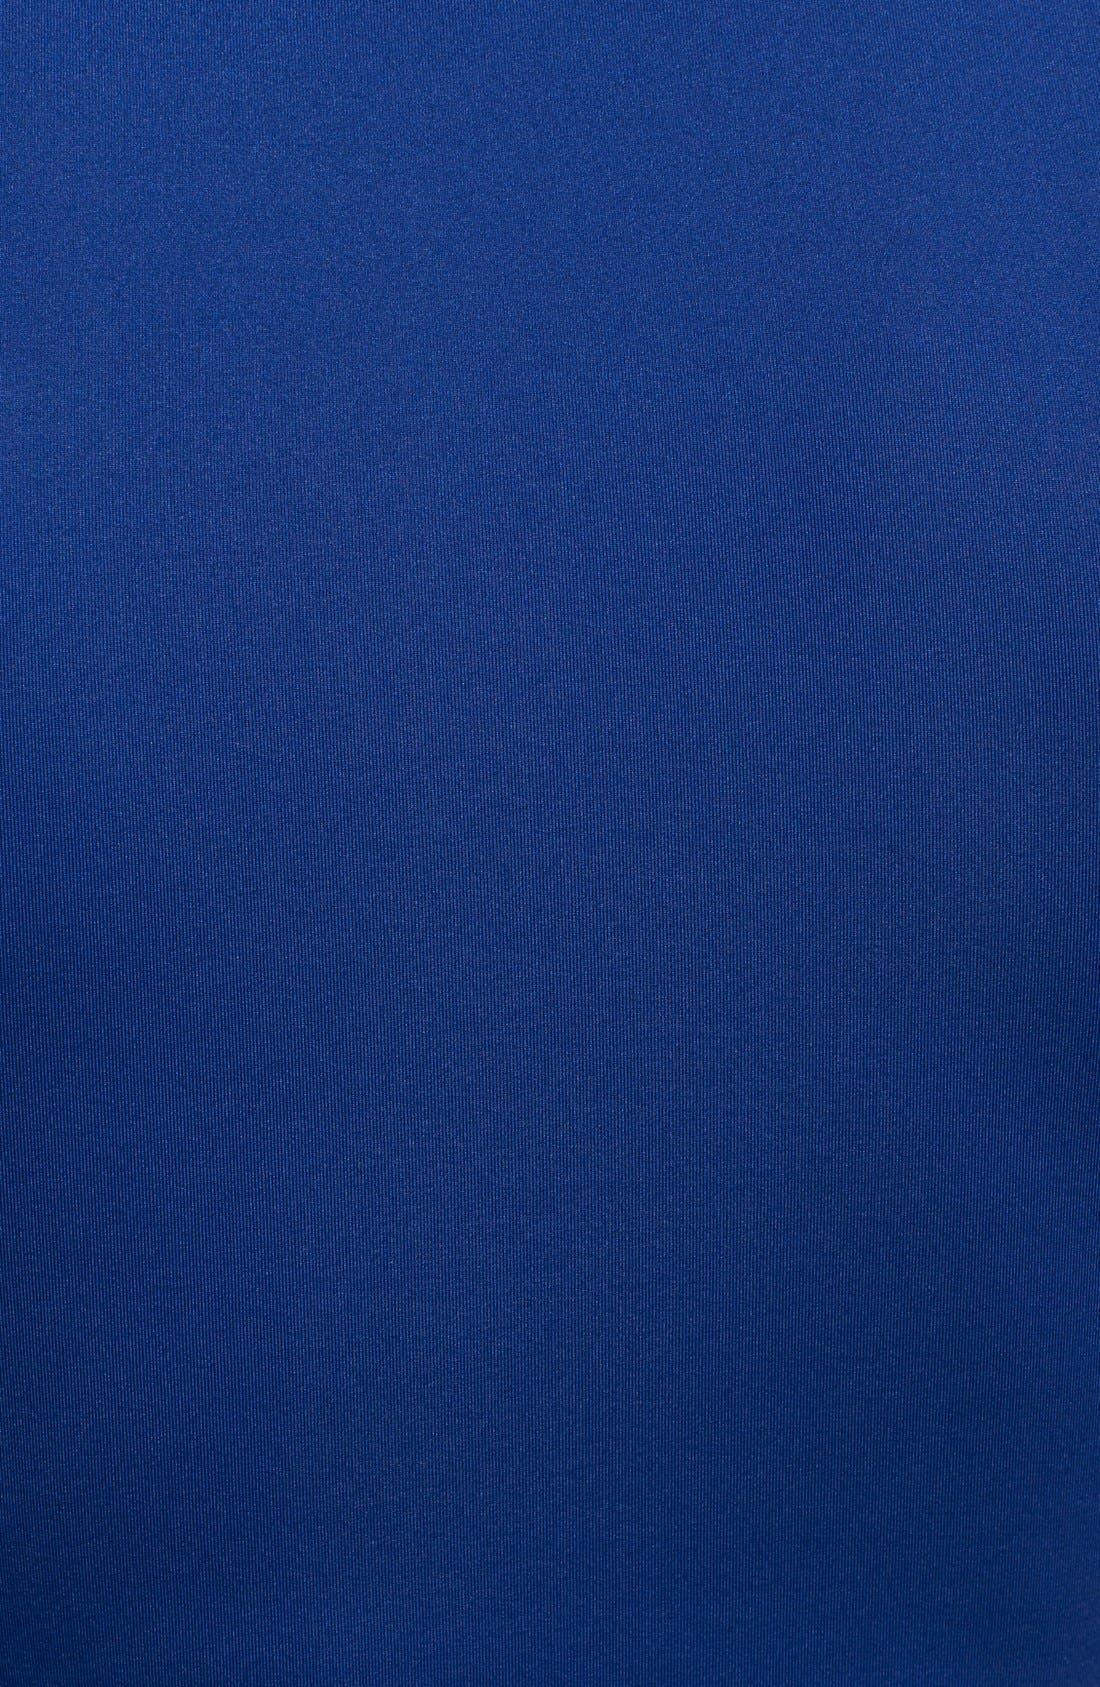 Alternate Image 3  - Under Armour HeatGear® Compression Fit T-Shirt